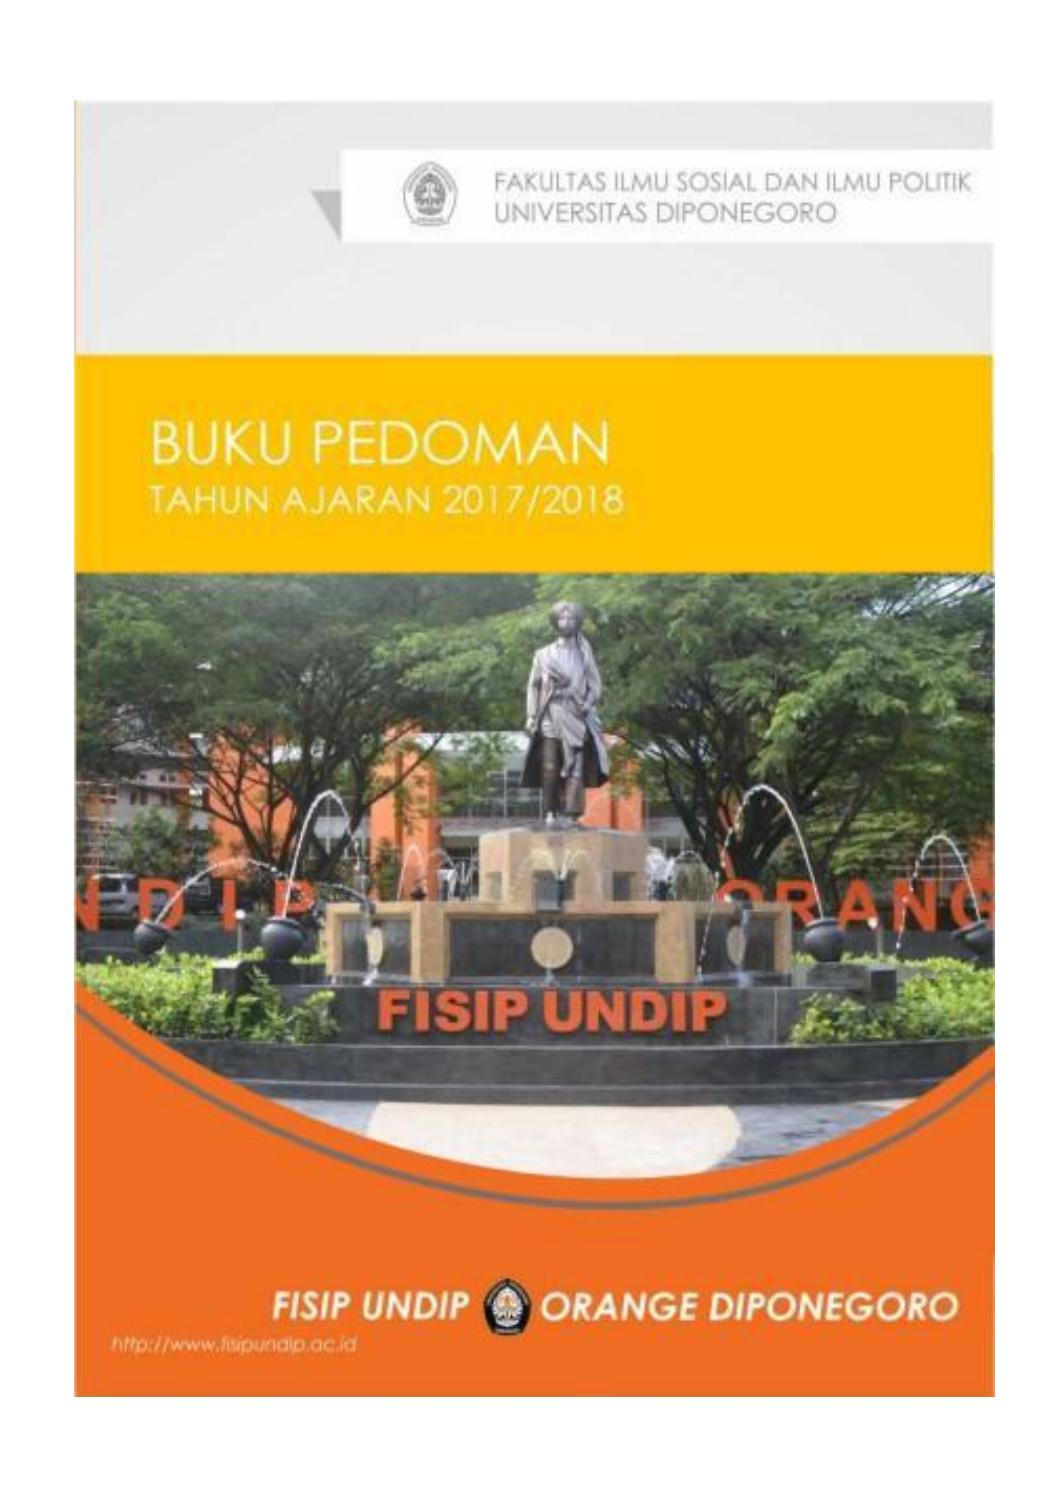 Buku Pedoman 2017 2018 By Orange Diponegoro Issuu